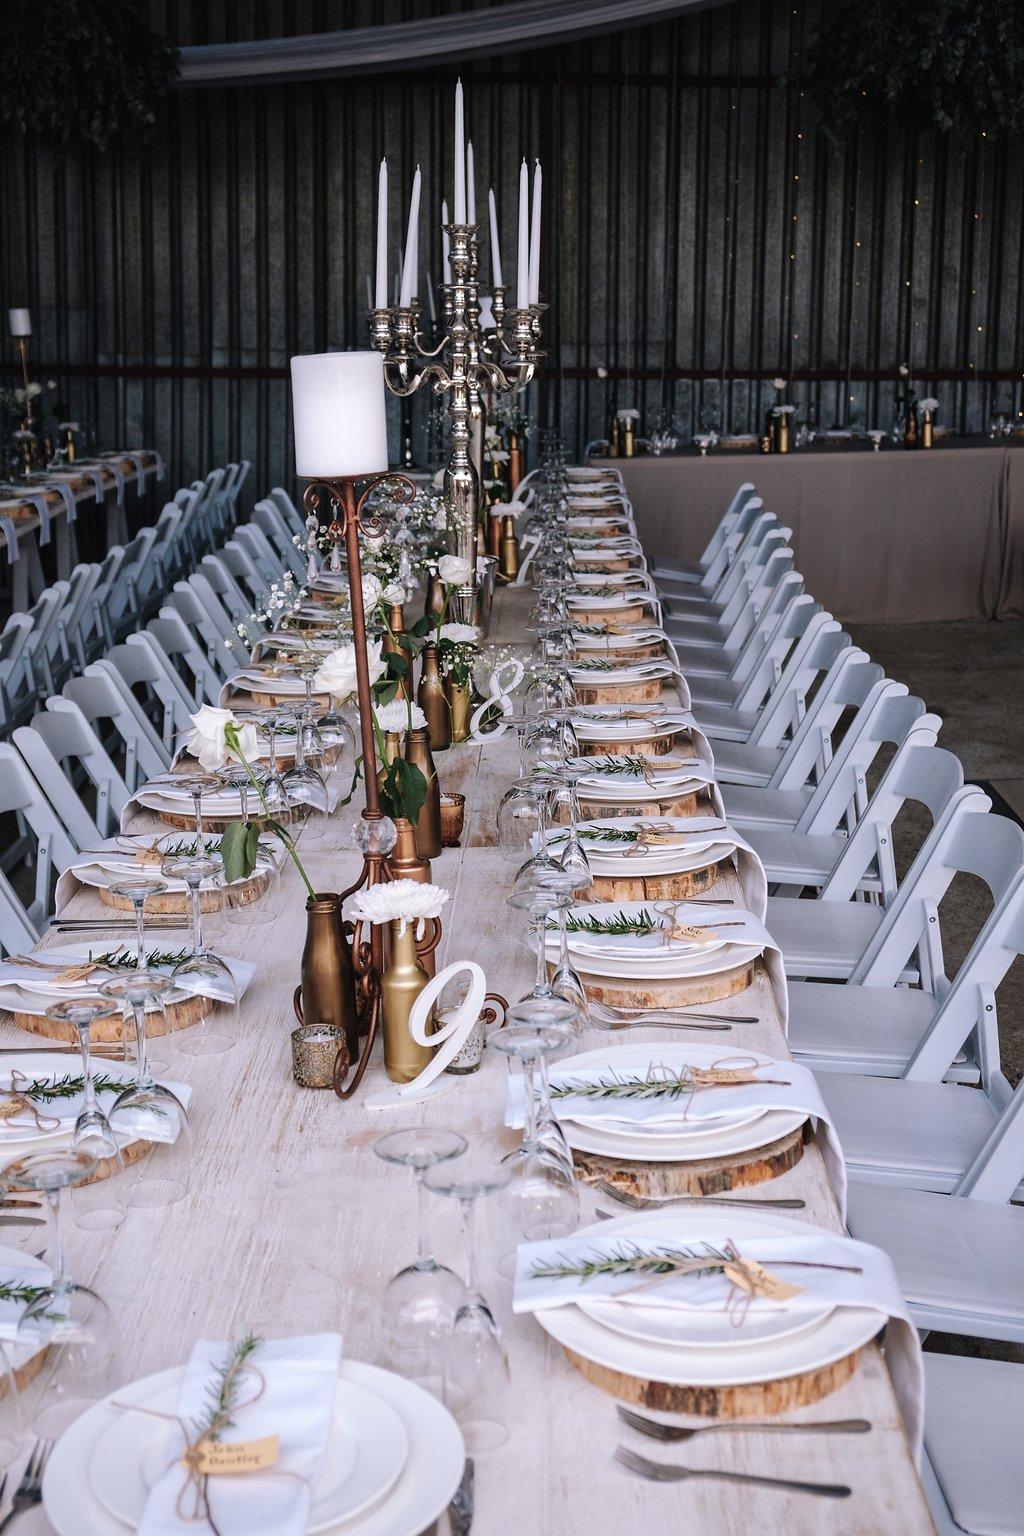 Gorgeous Simple Wedding Centerieces - Farm-Forest Wedding - The Overwhelmed Bride Wedding Blog